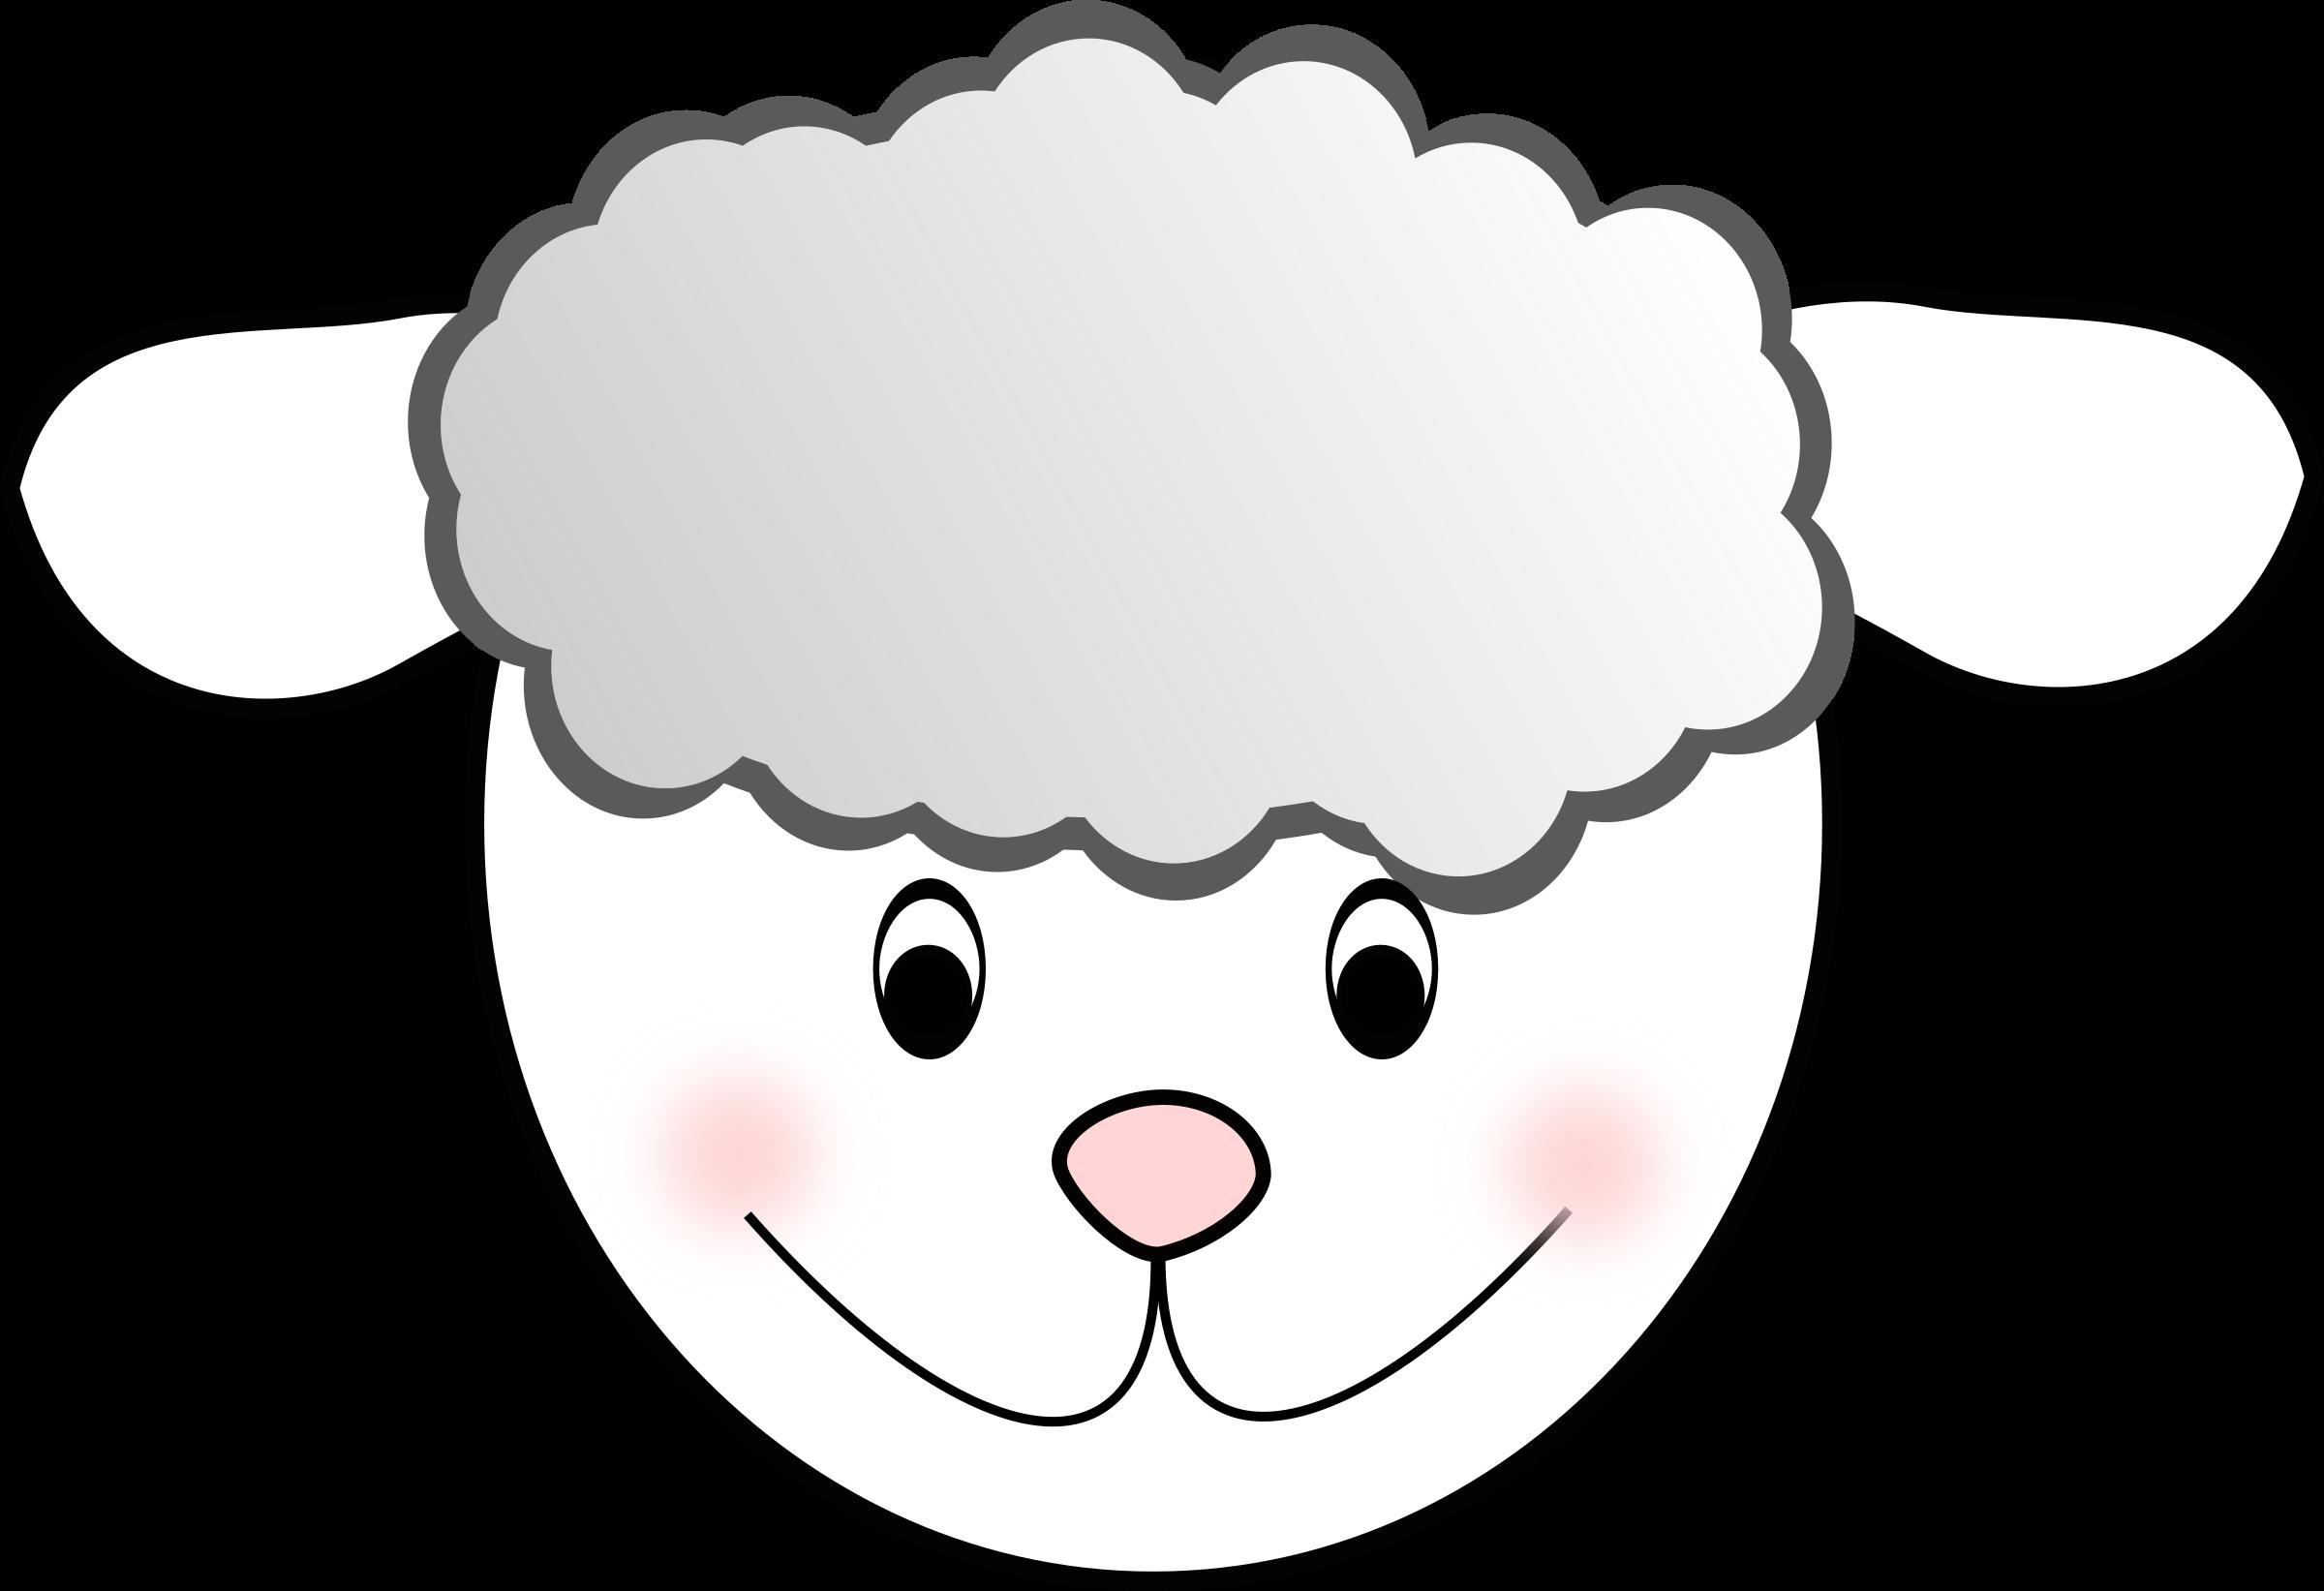 Lamb clipart template. Sheep nice big image